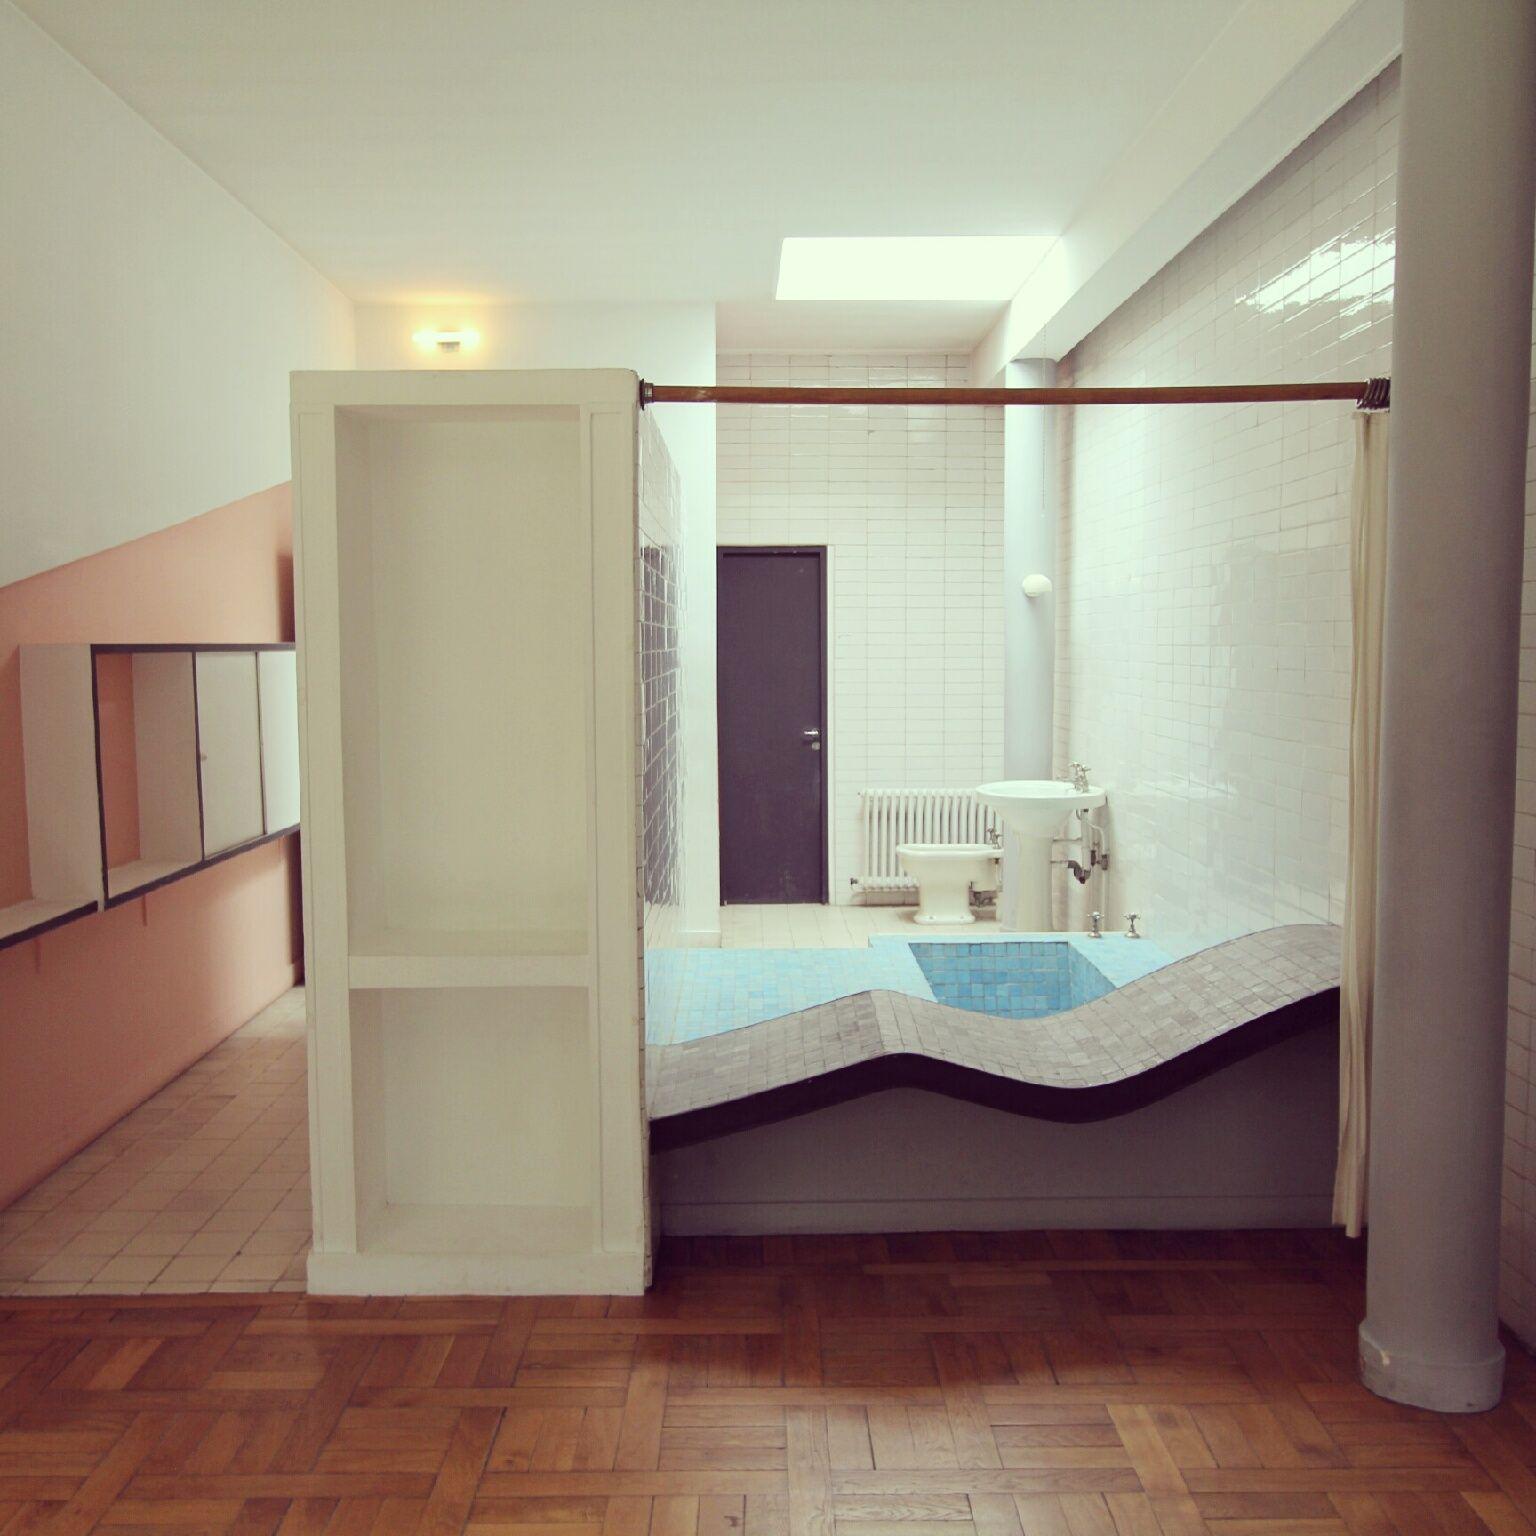 villa savoye bathroom google search future home pinterest salle de bains salle et cuisines. Black Bedroom Furniture Sets. Home Design Ideas